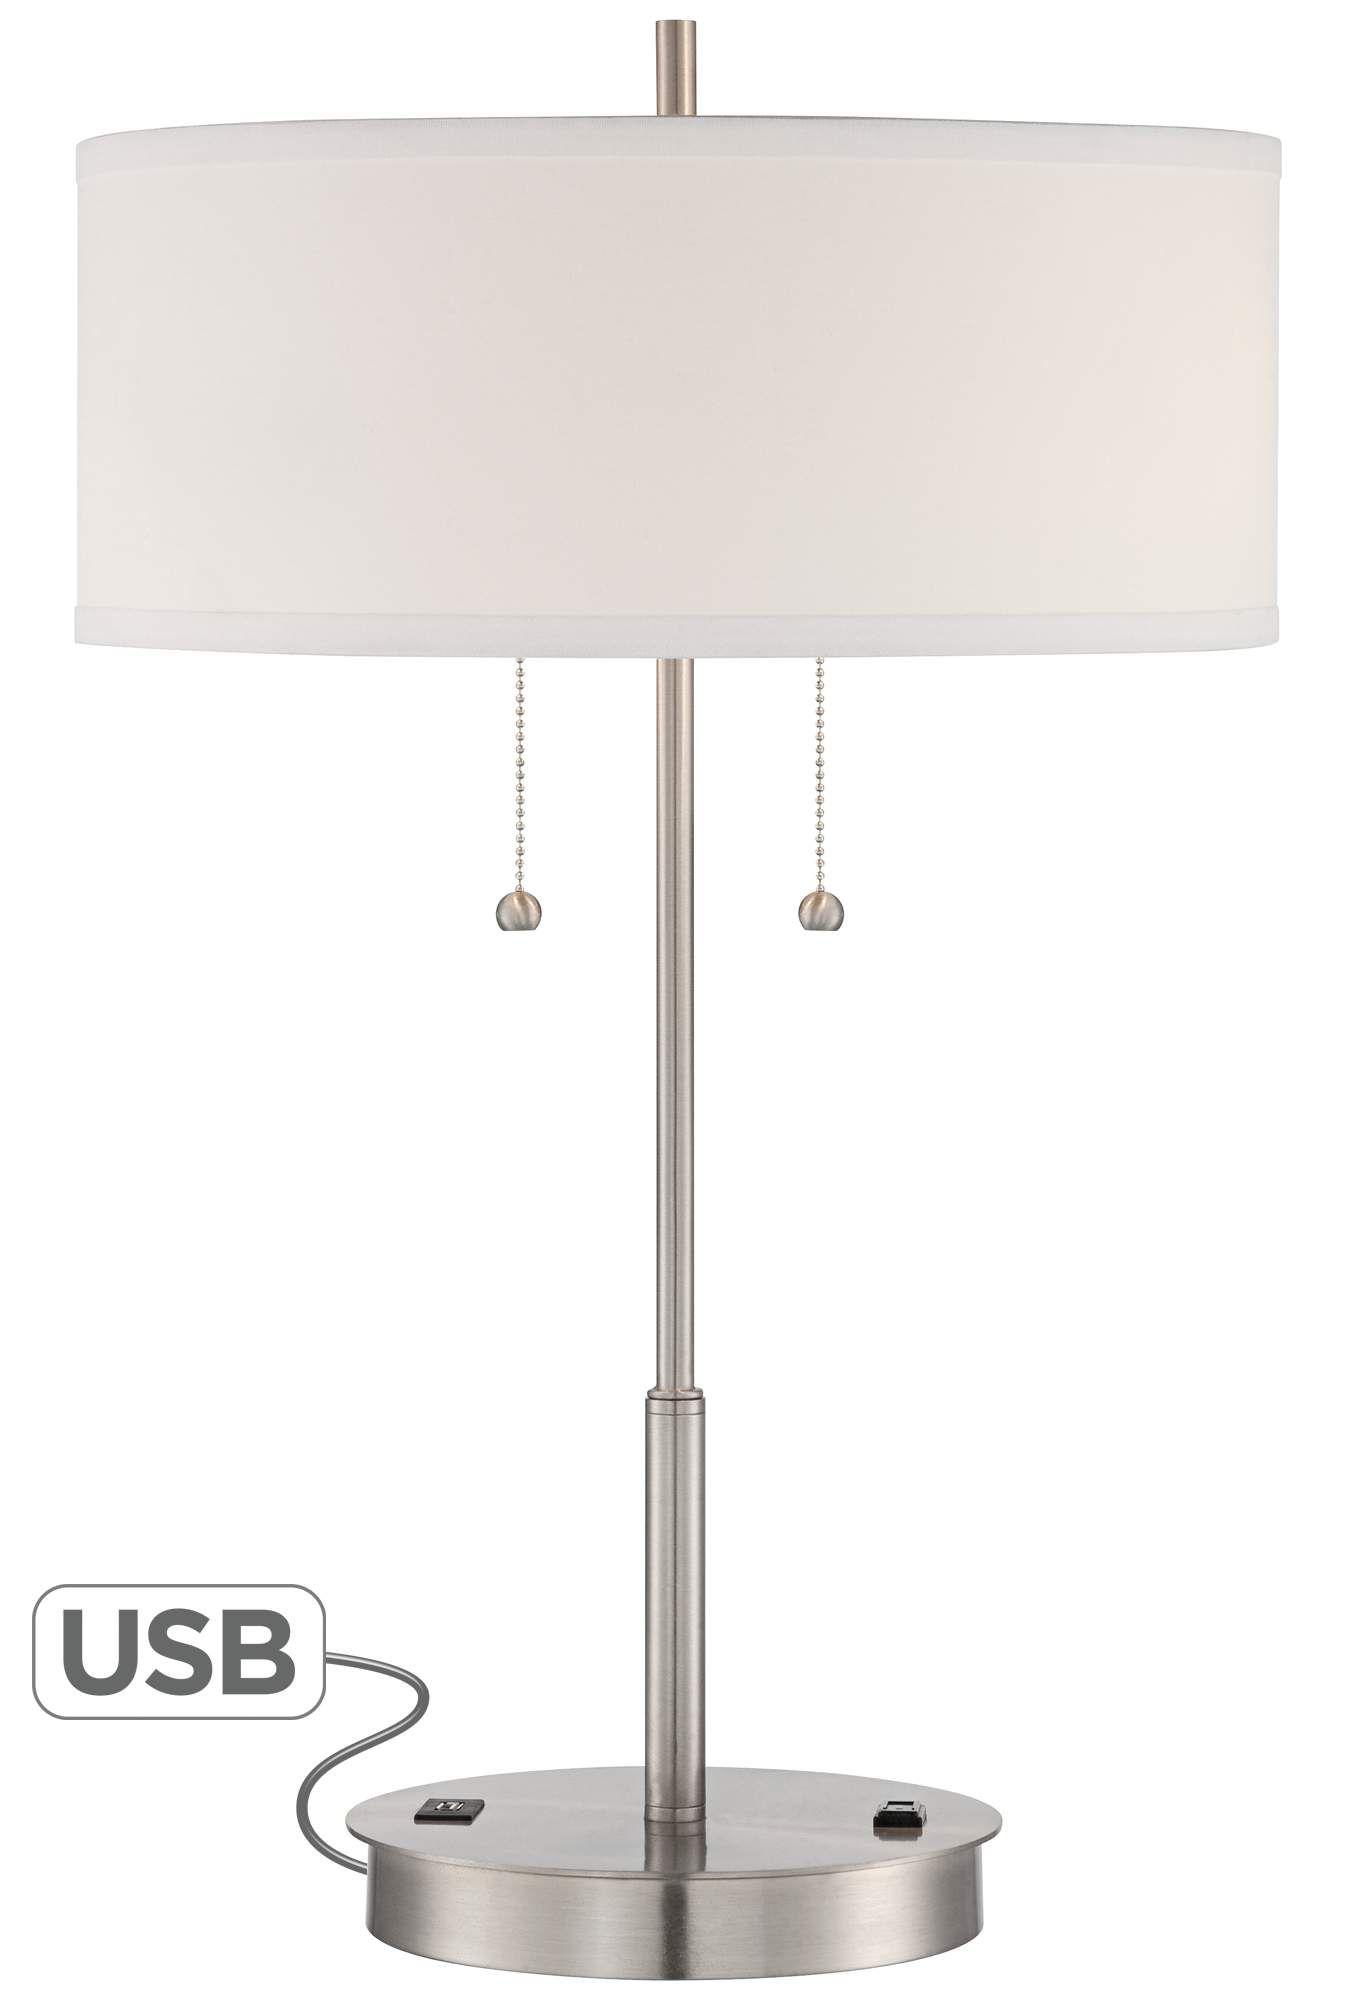 end table lamps with usb ports bruin blog. Black Bedroom Furniture Sets. Home Design Ideas